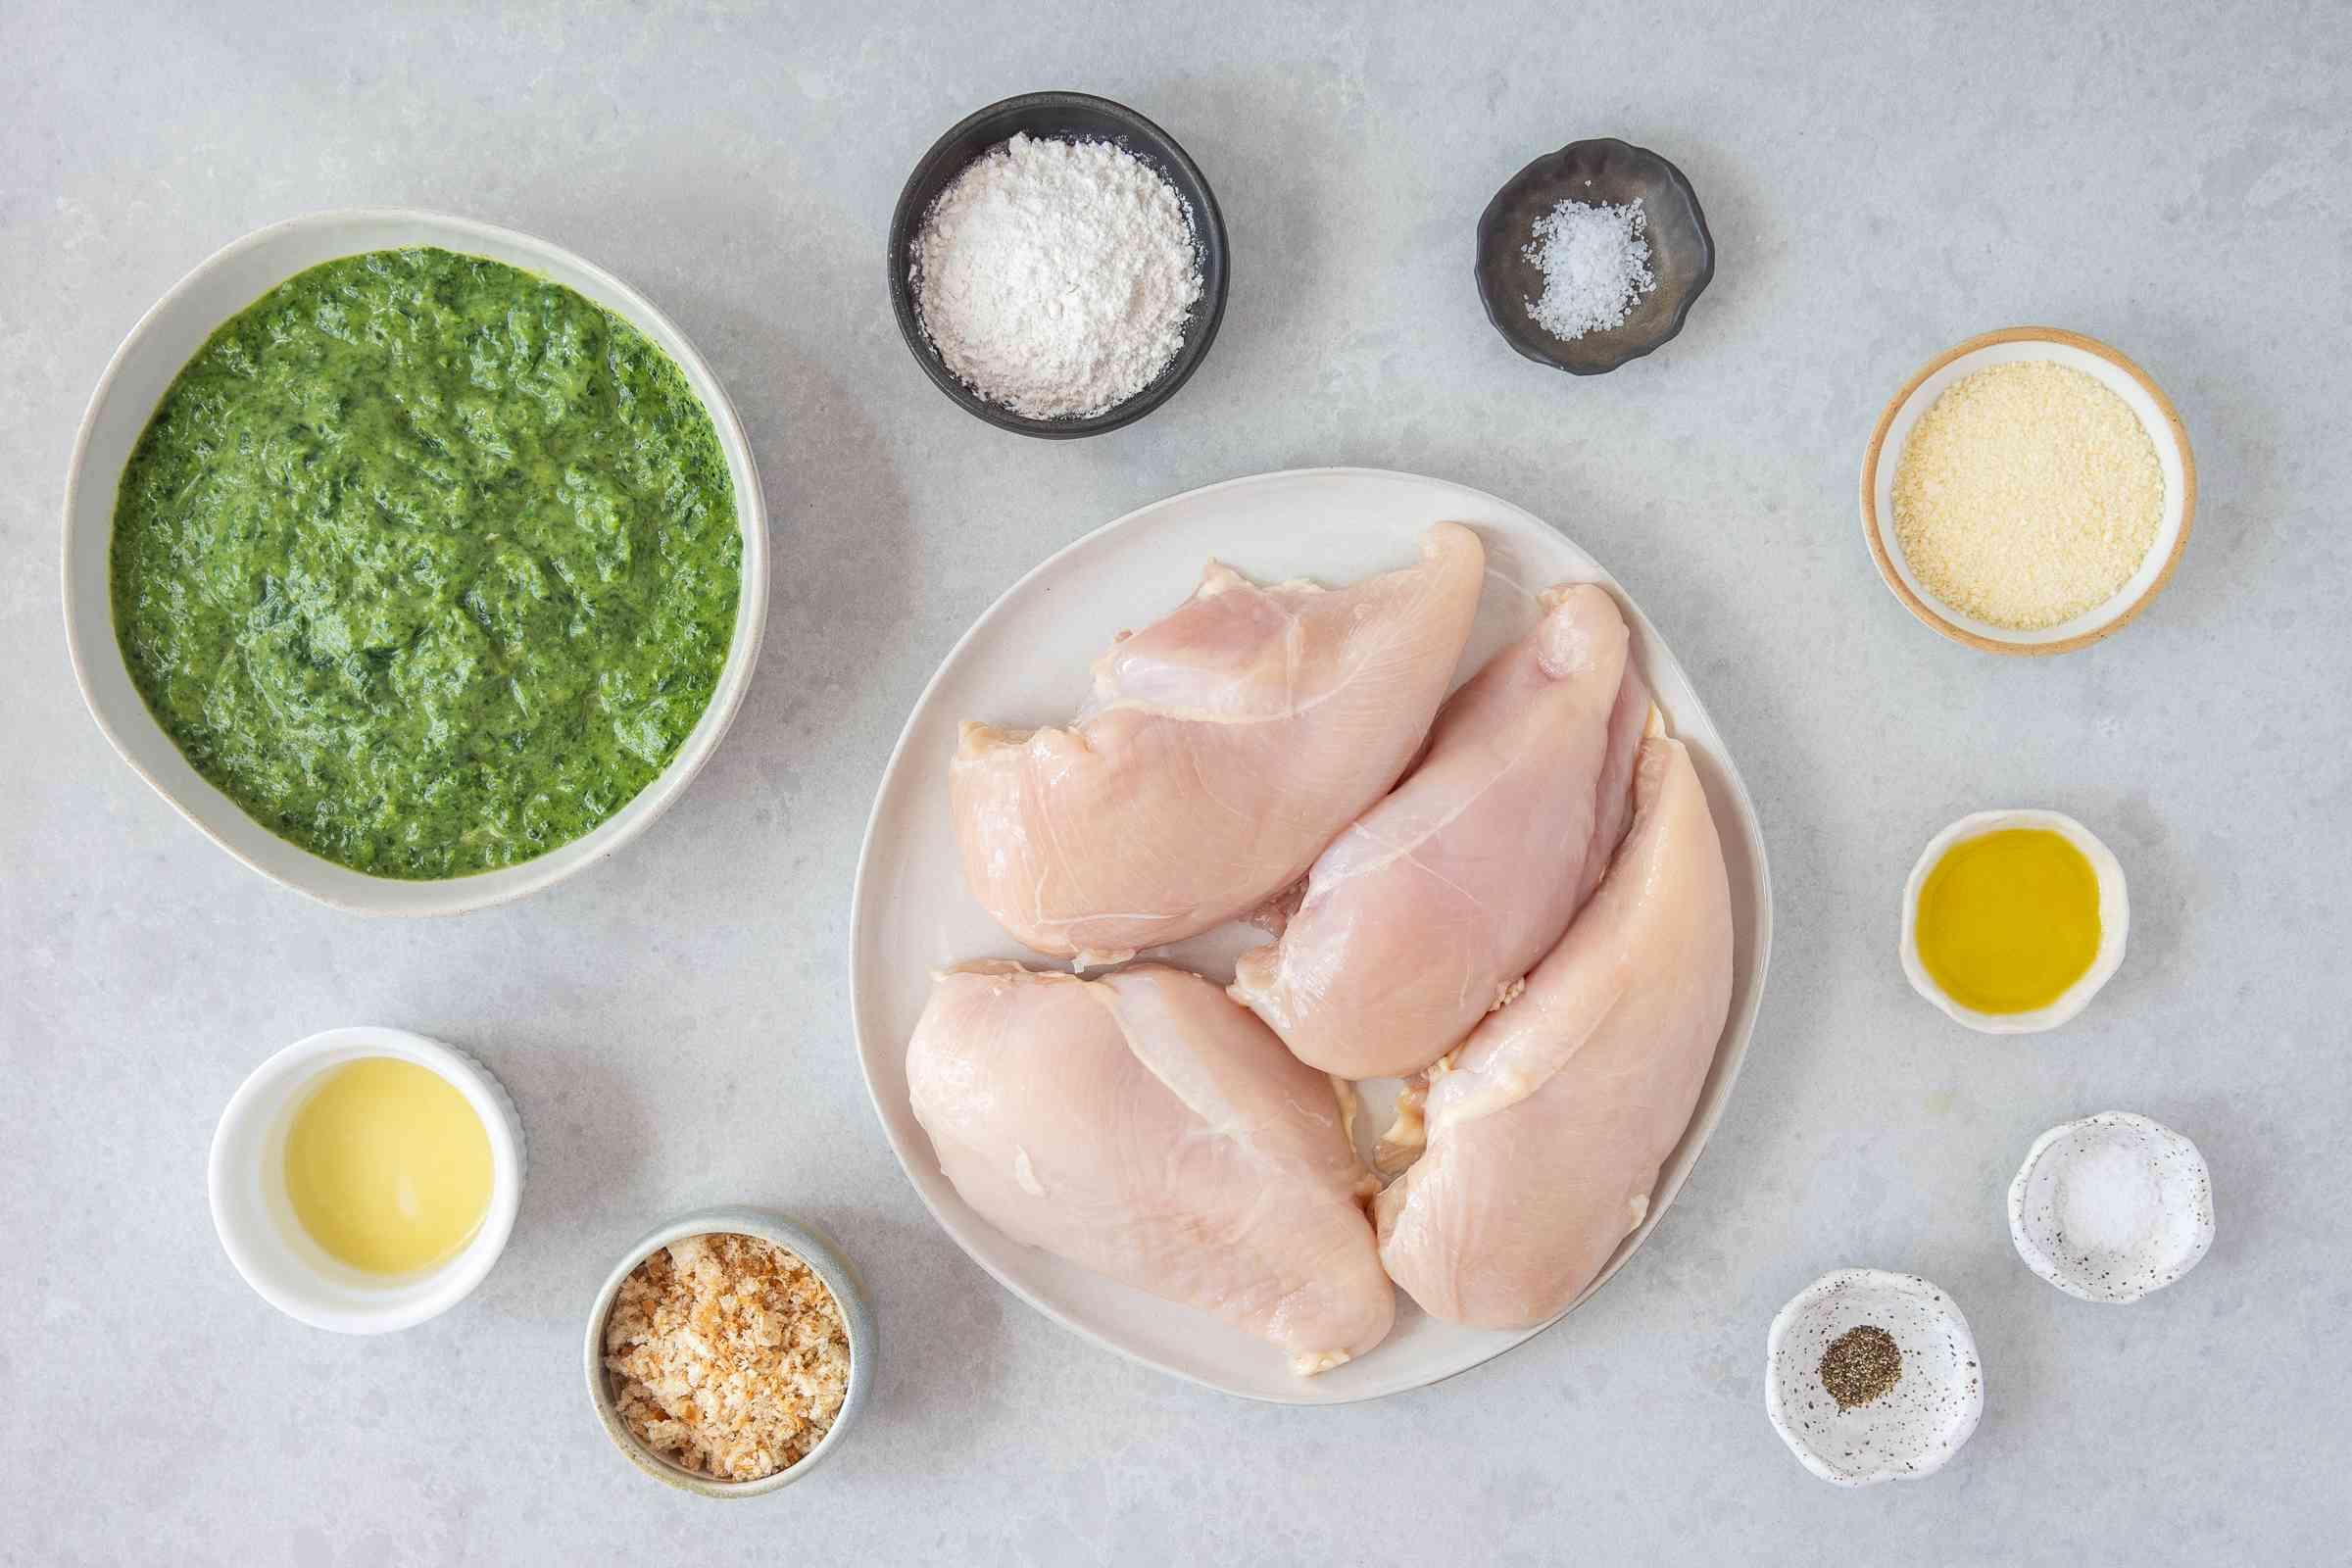 Easy Chicken Florentine Bake With Spinach Souffle ingredients